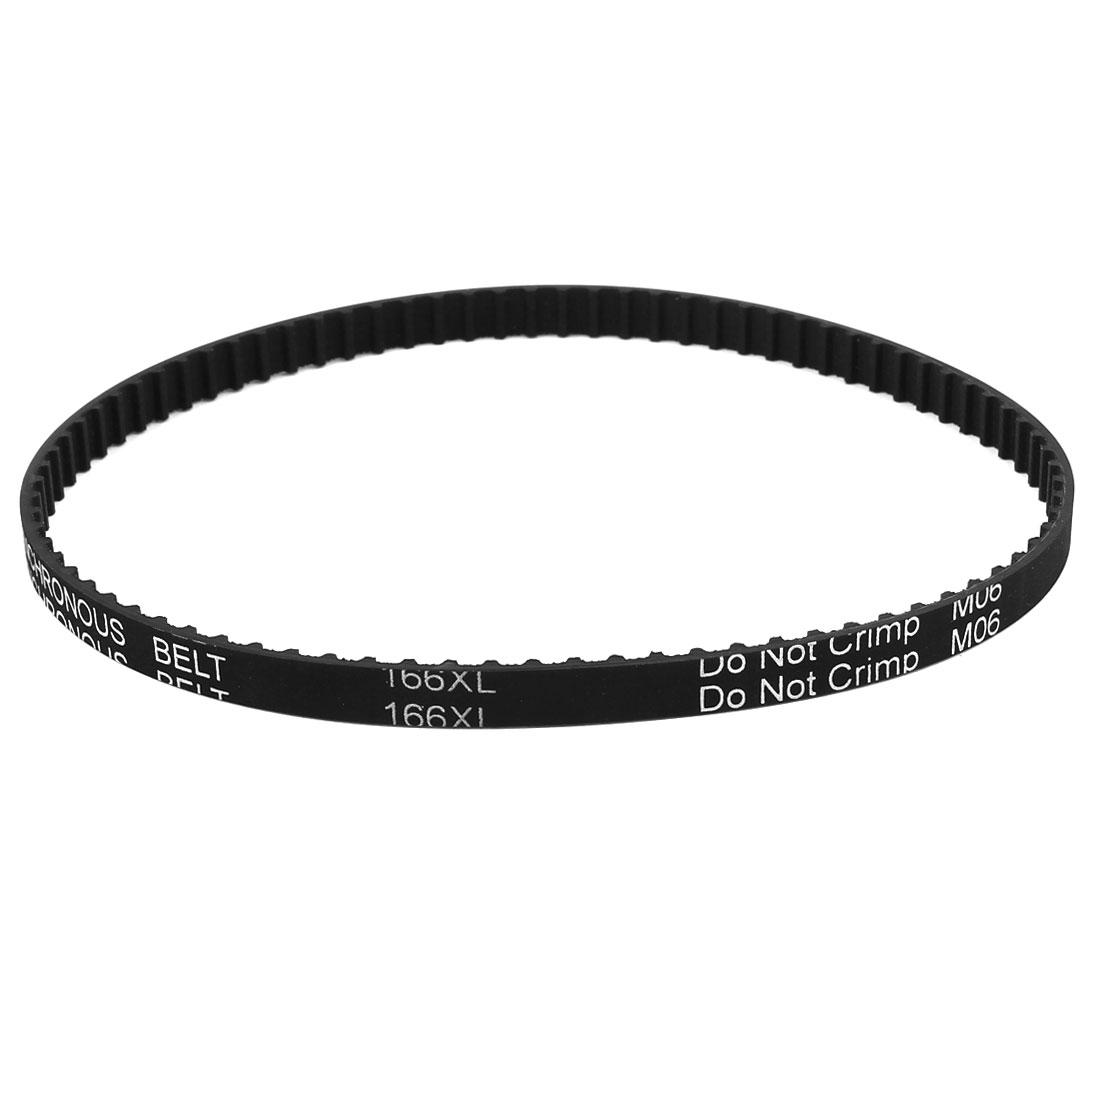 Dishwasher Black Rubber Timing Belt 83 Teeth 7.9mm Wide 166XL 031